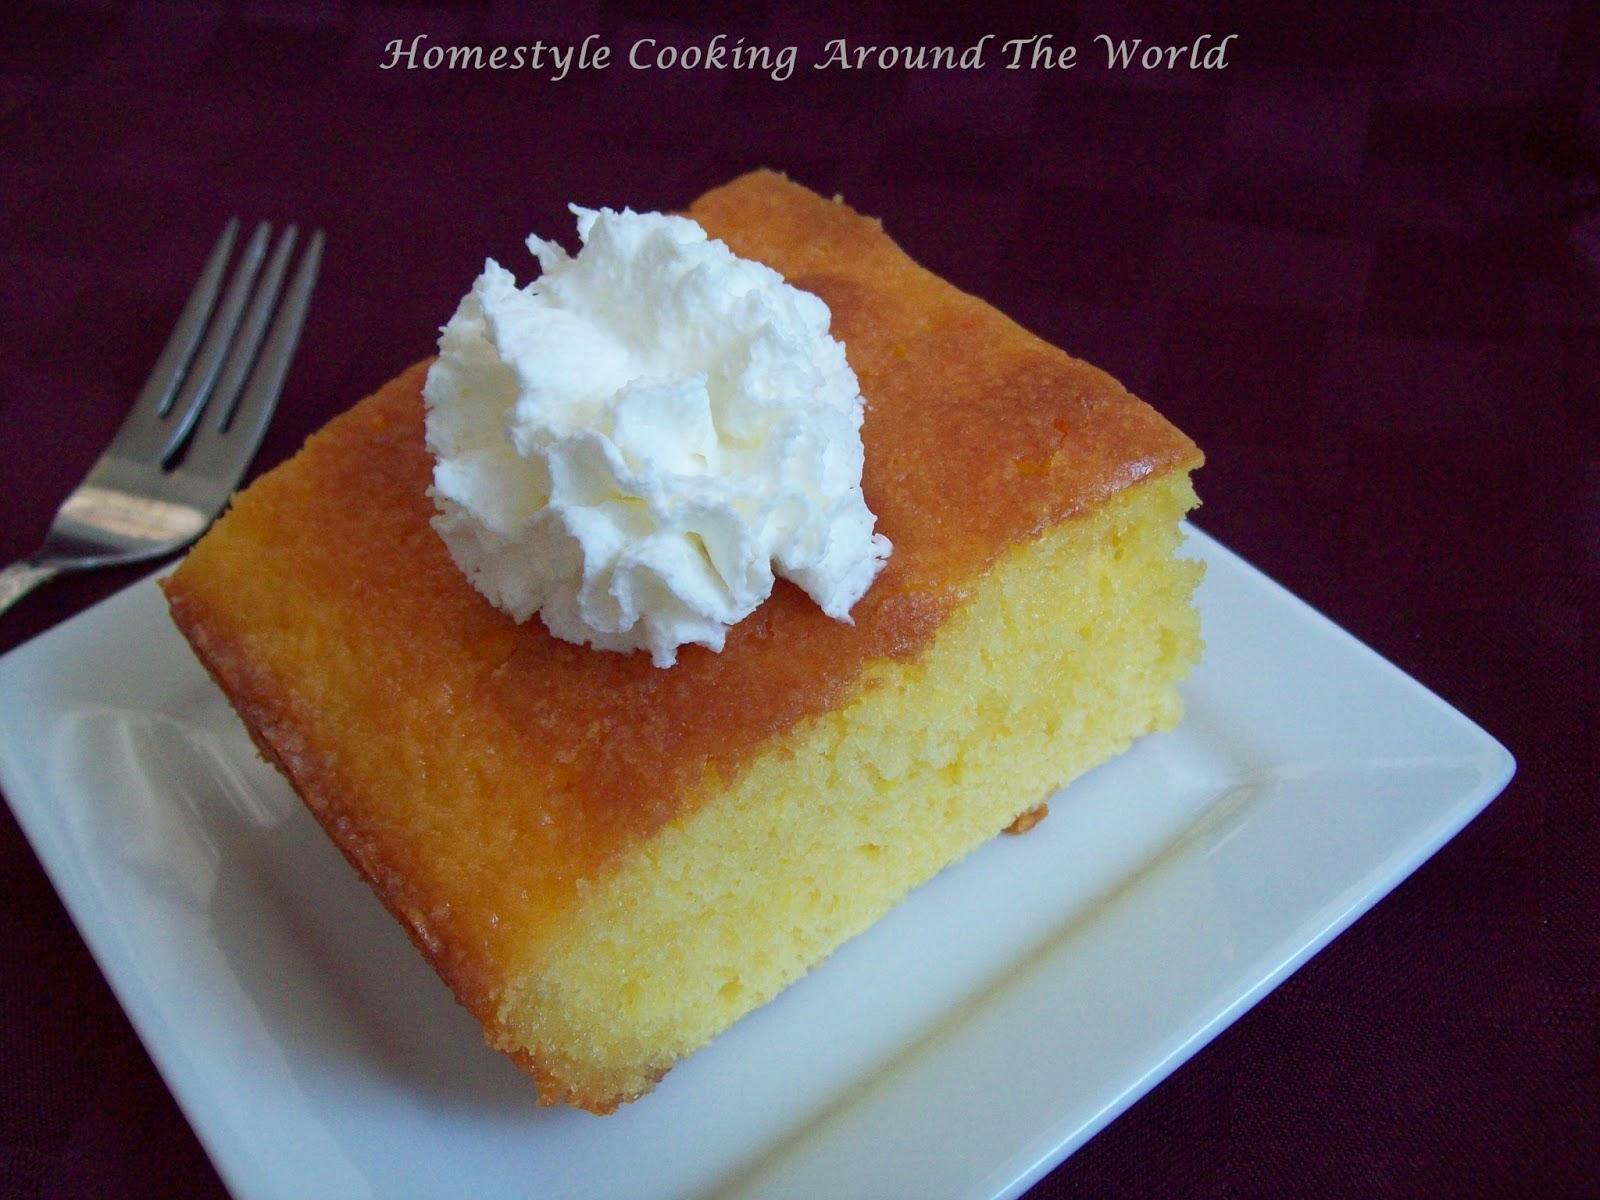 Cake Recipe With Lemon Jello: Homestyle Cooking Around The World: Lemon Glaze Cake